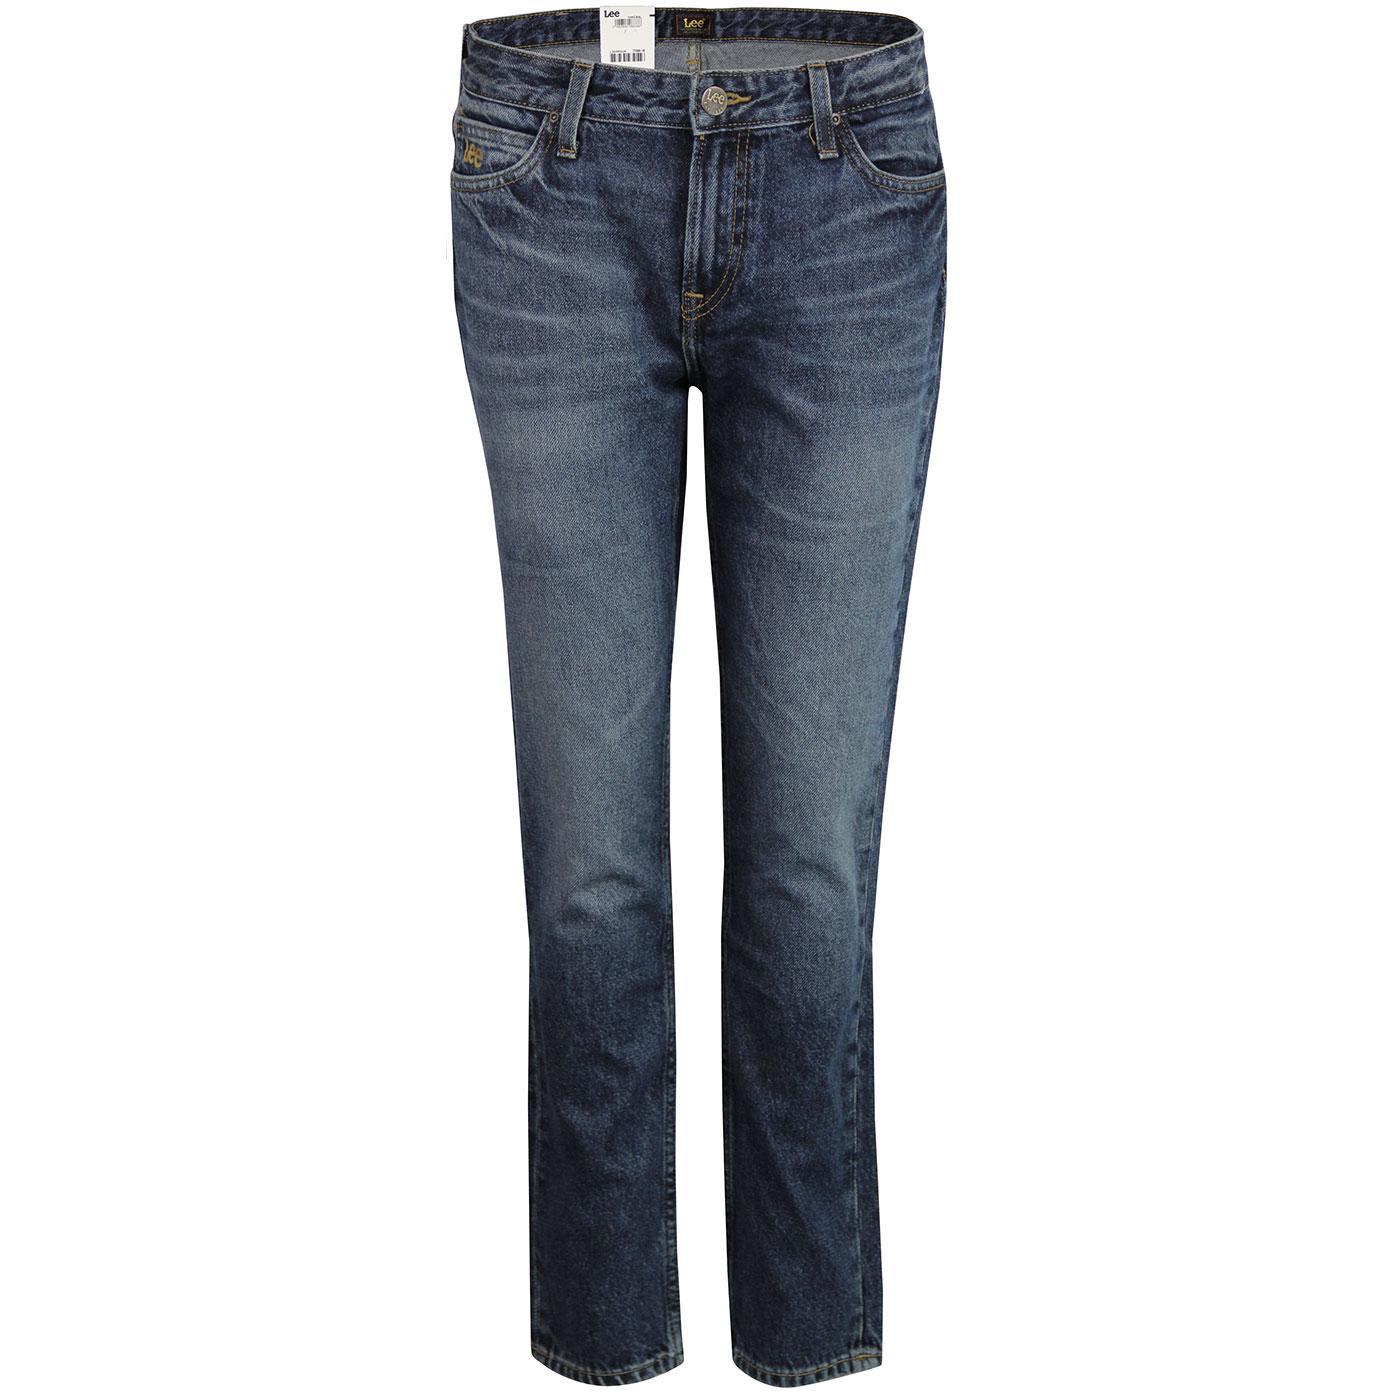 Elly LEE High Waist Slim Straight Denim Jeans (RW)